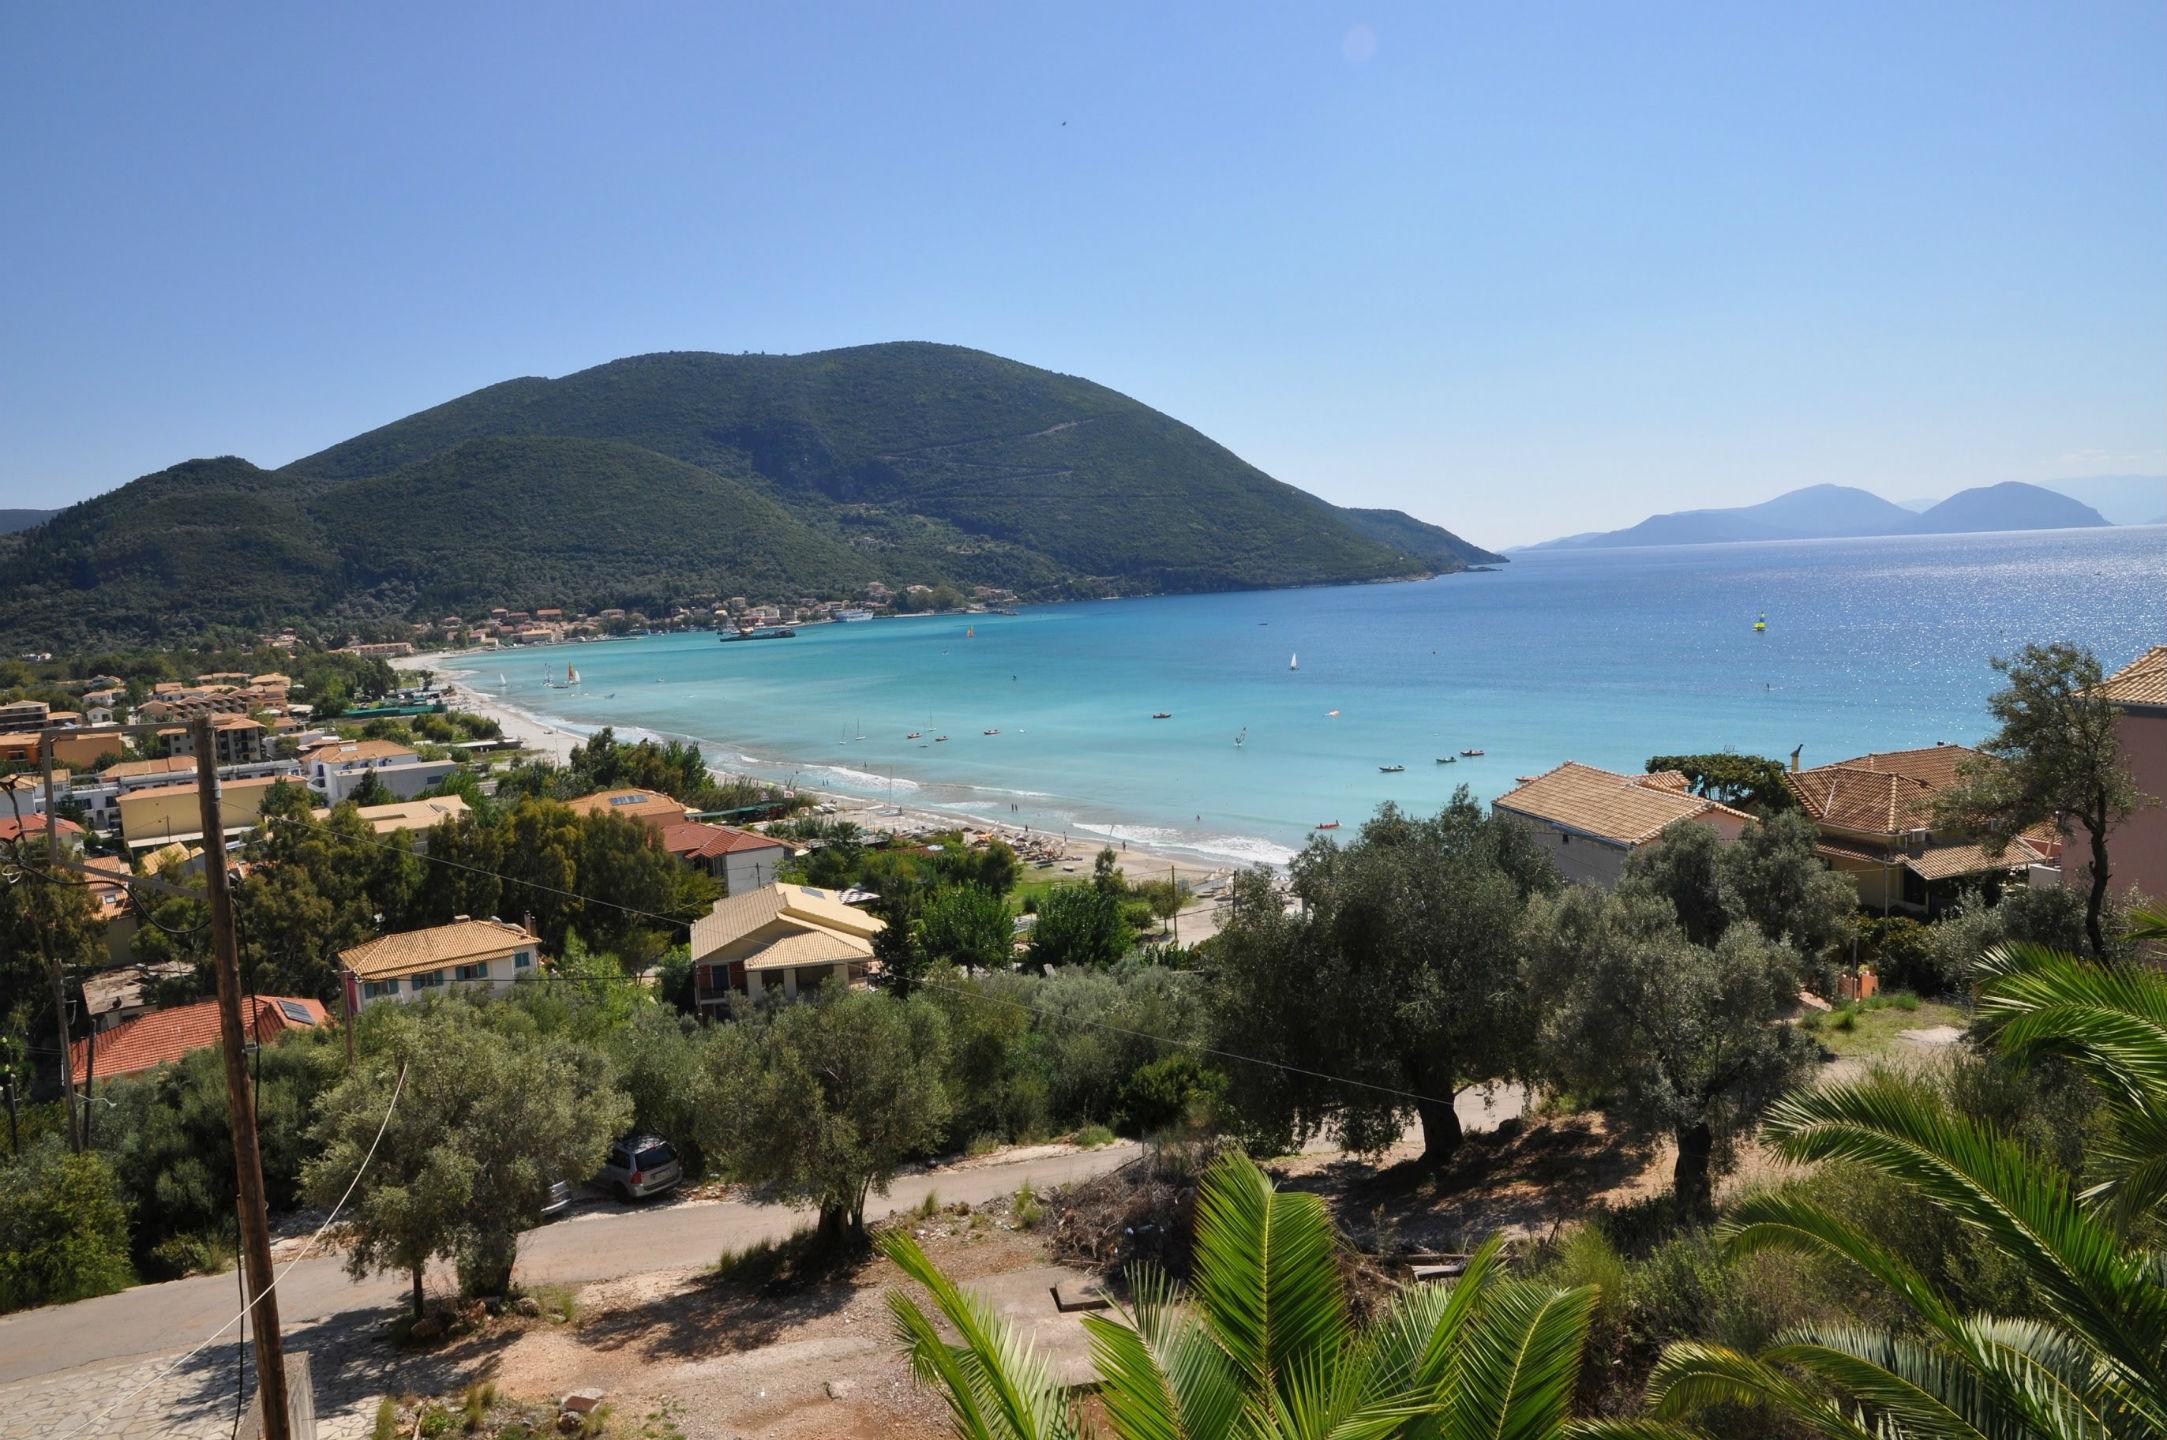 lefkada-beaches-vassiliki-beach-left